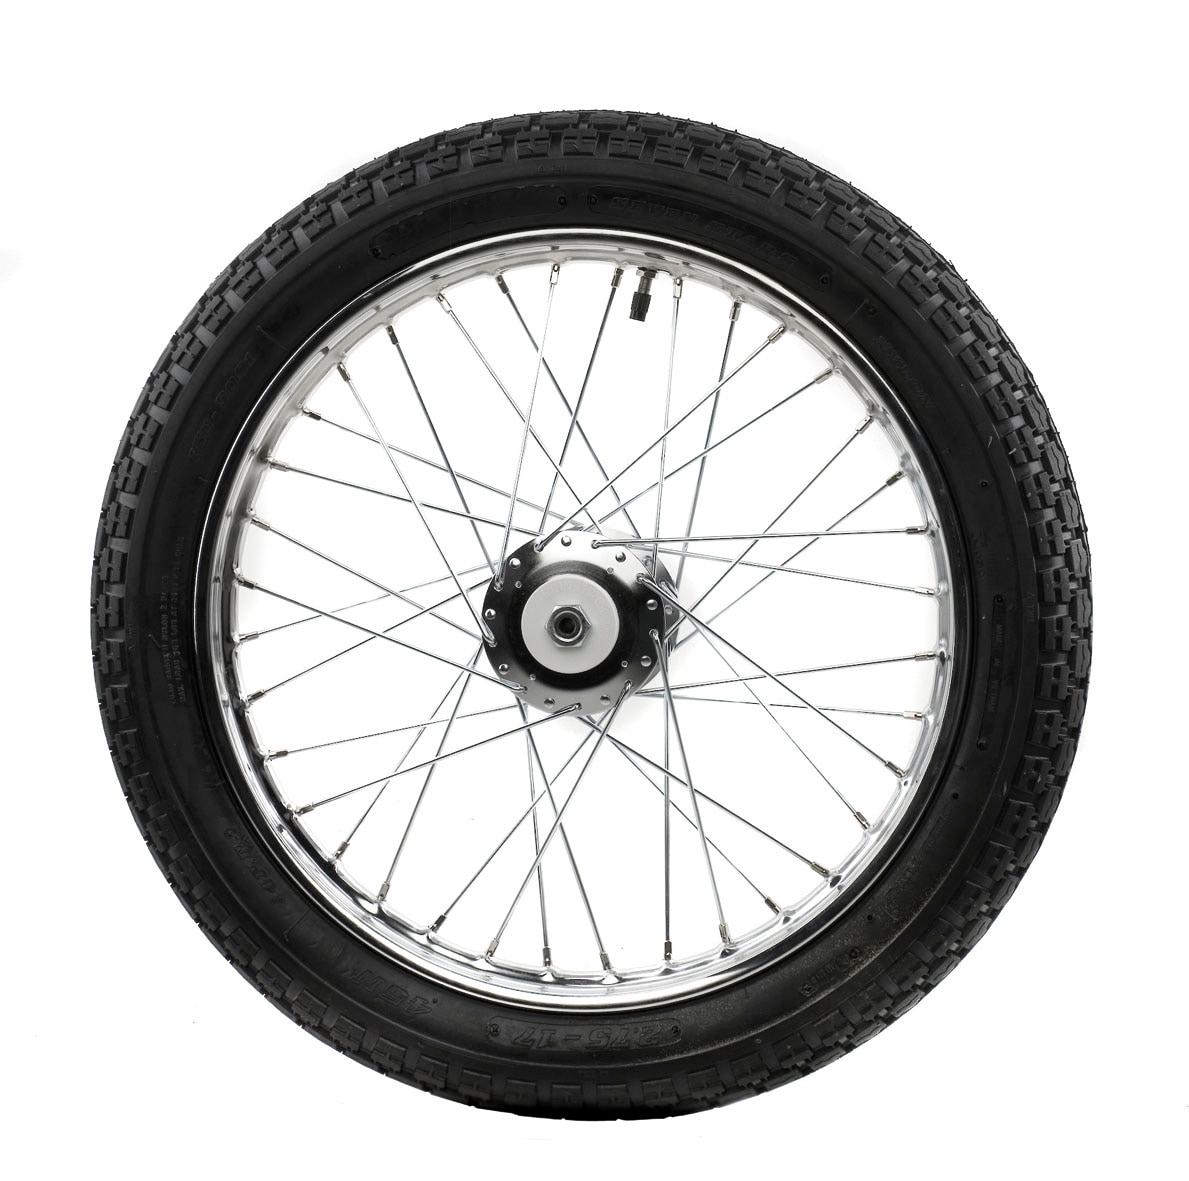 "Finntack Rockcart hjul, 17""x2,75 (selges enkeltvis)"